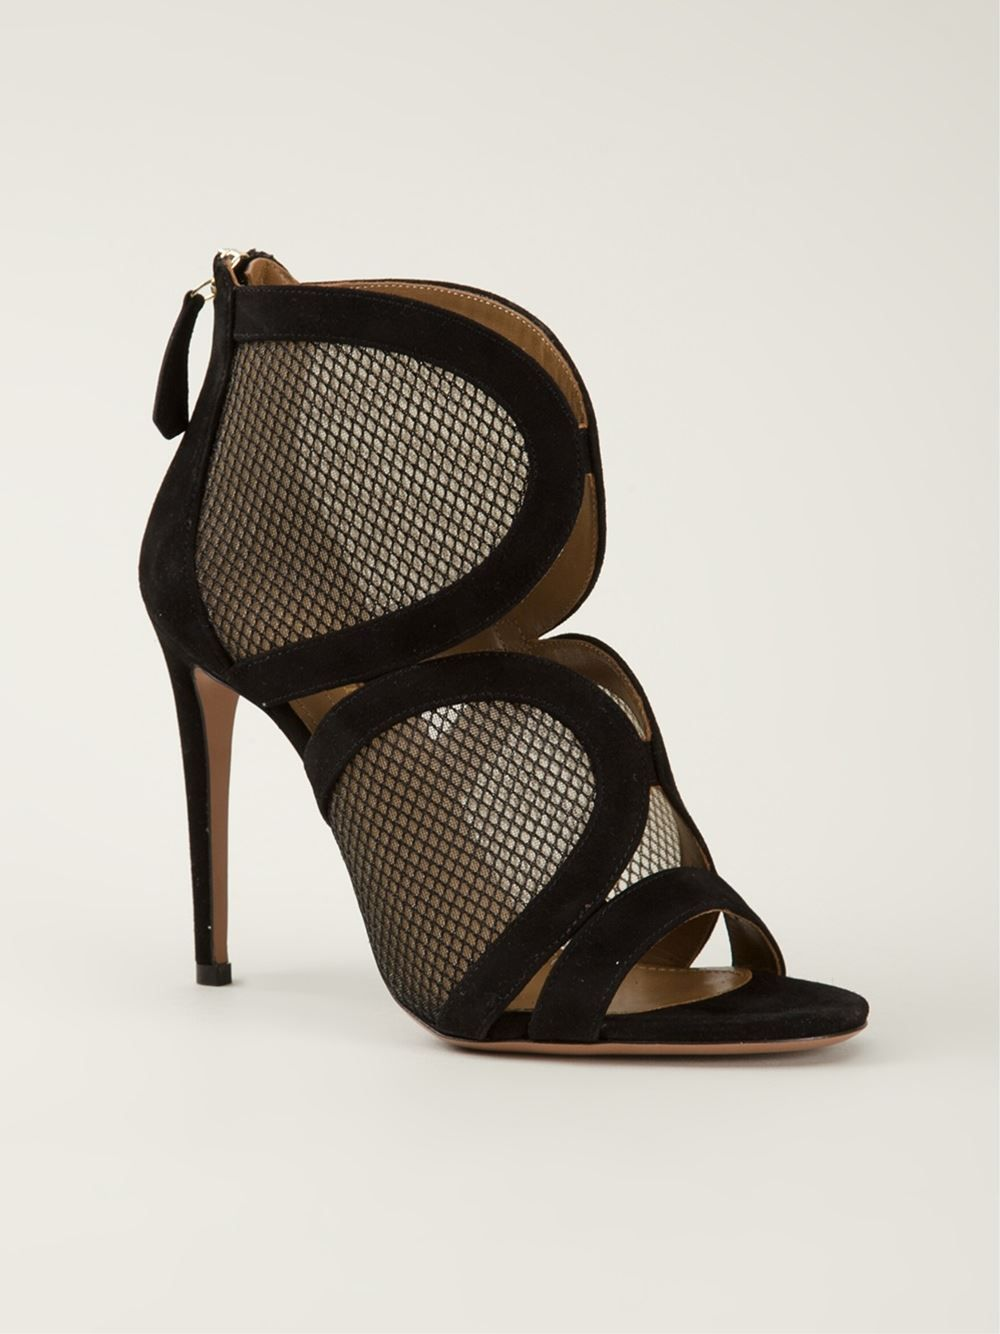 Aquazzura 'memphis' Mesh Contrast Sandals - -renaissance- - Farfetch.com.  Black SandalsBlack HeelsShoes ...